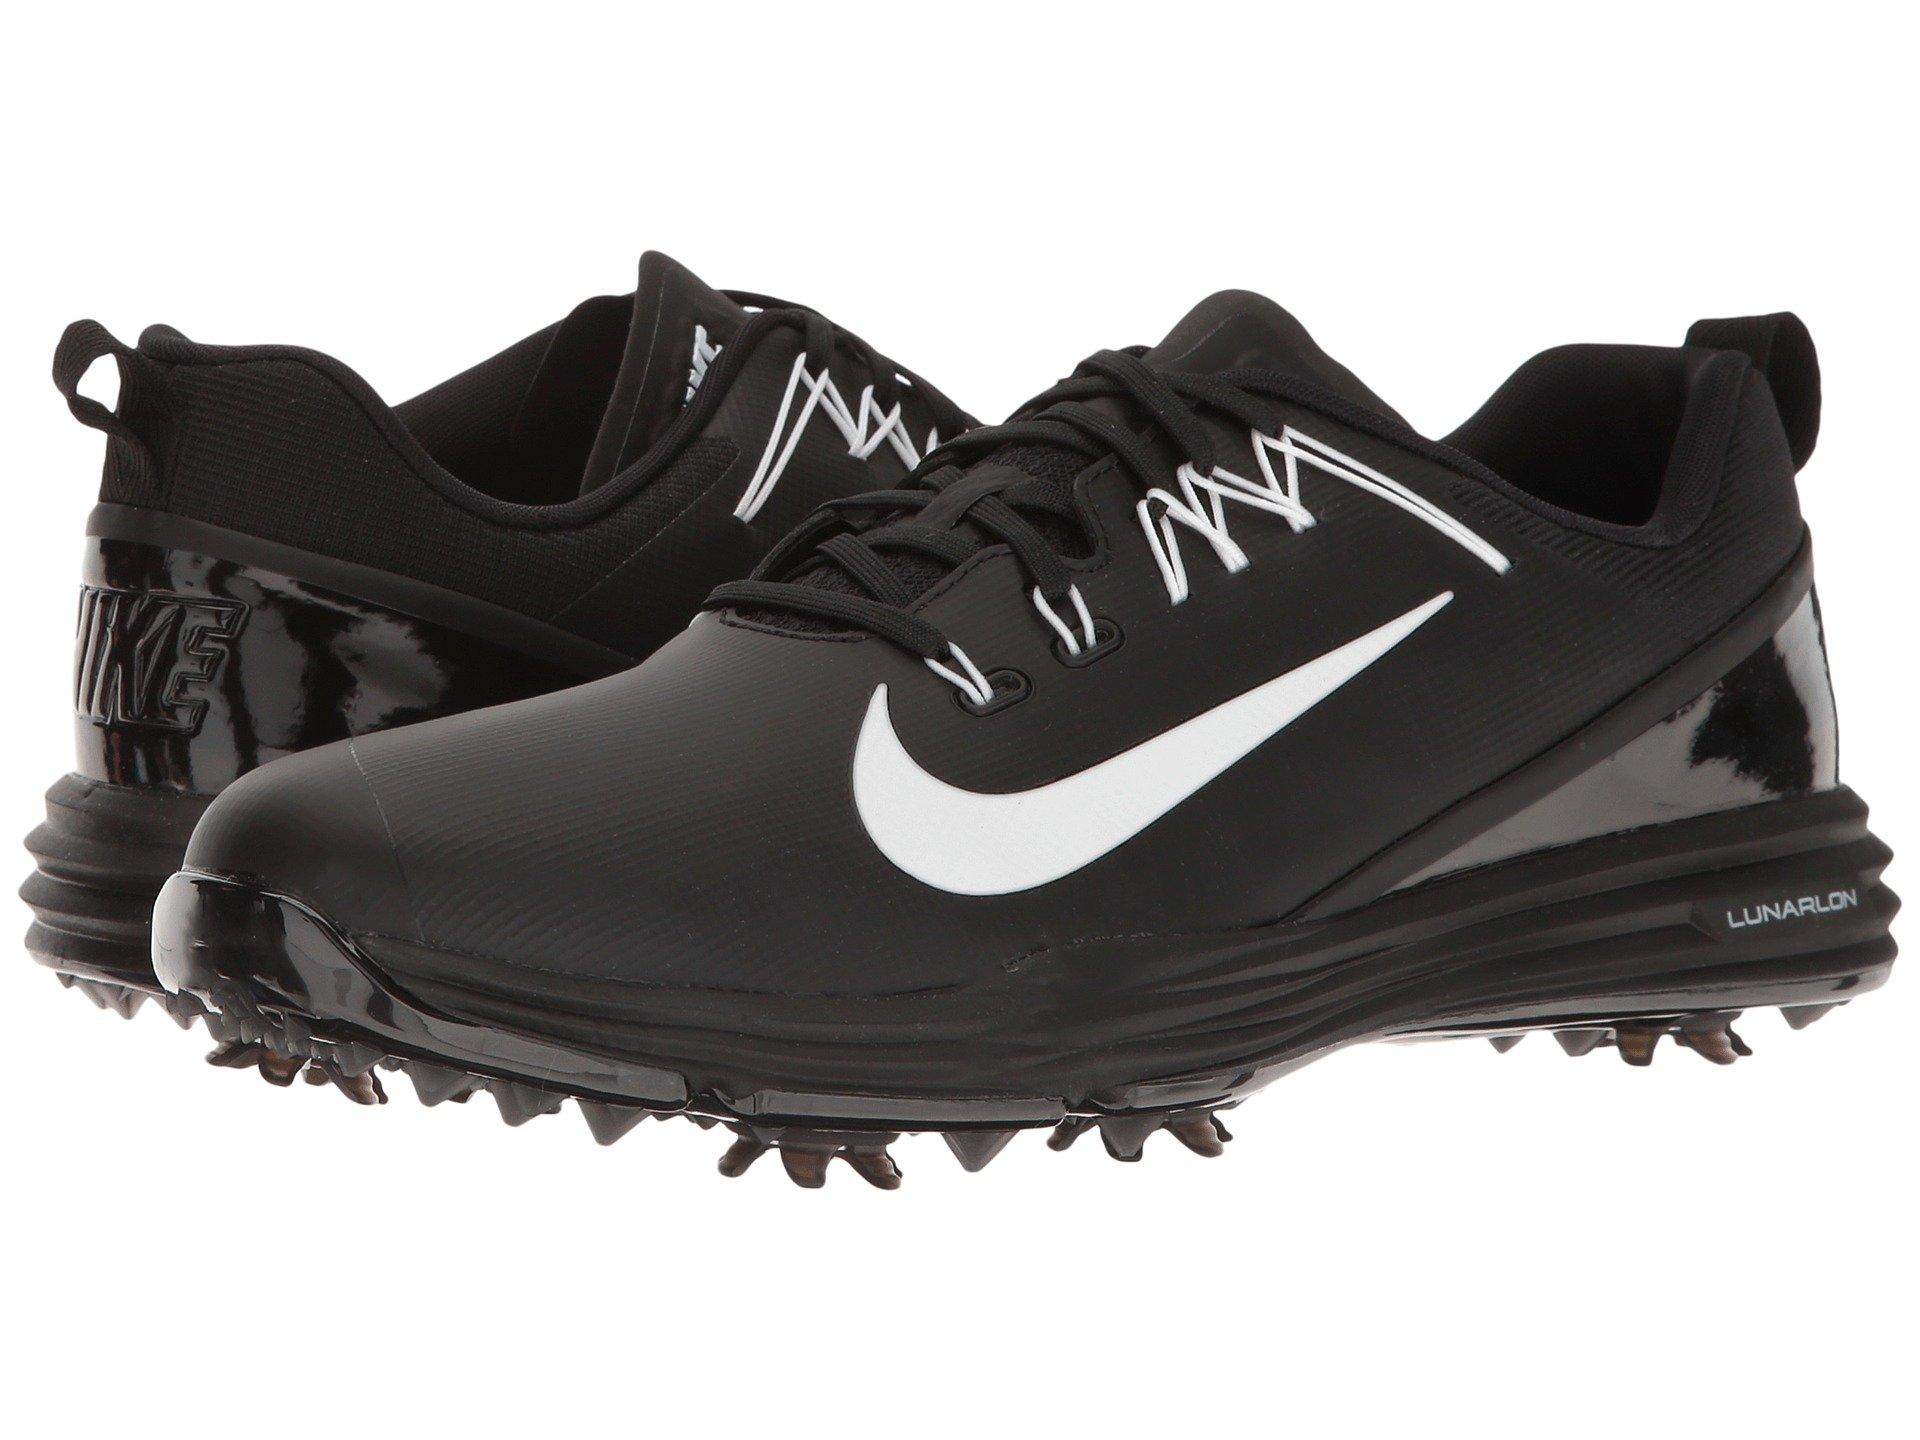 Nike Lunar Command Golf Shoes Dark Grey Volt Size